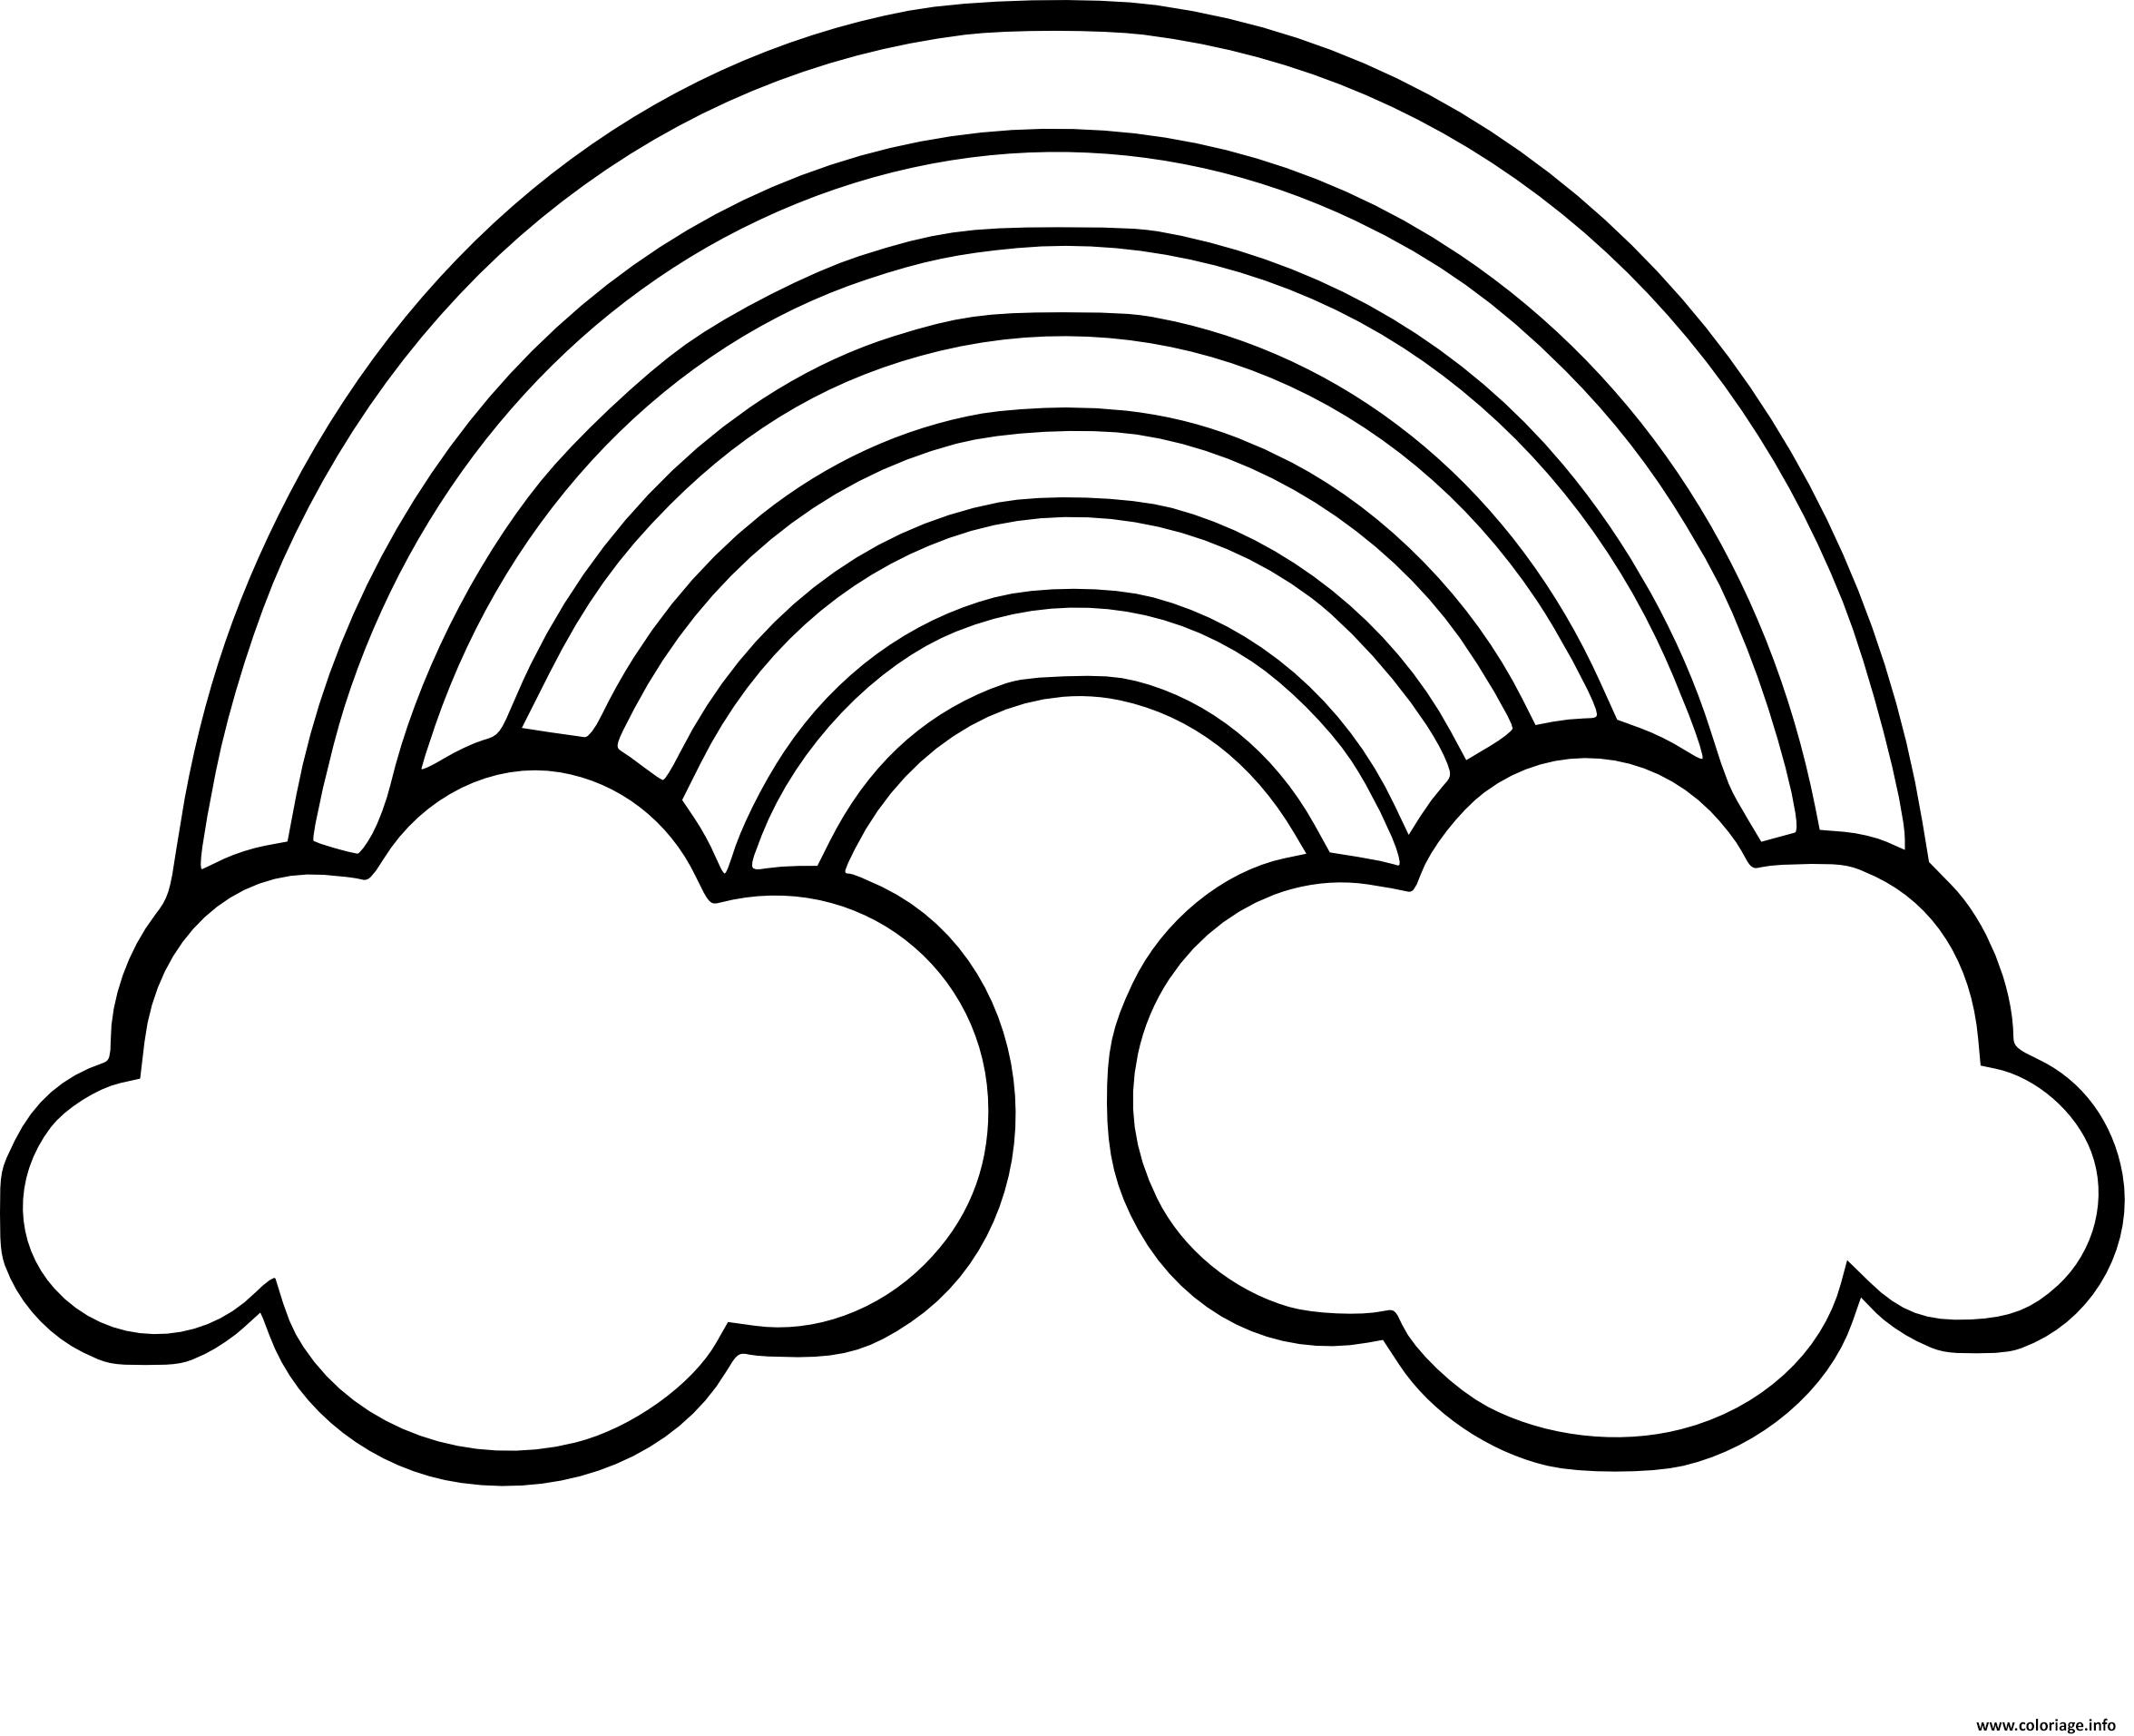 Coloriage Darc En Ciel En Ligne.Coloriage Arc En Ciel Avec Nuages Dessin